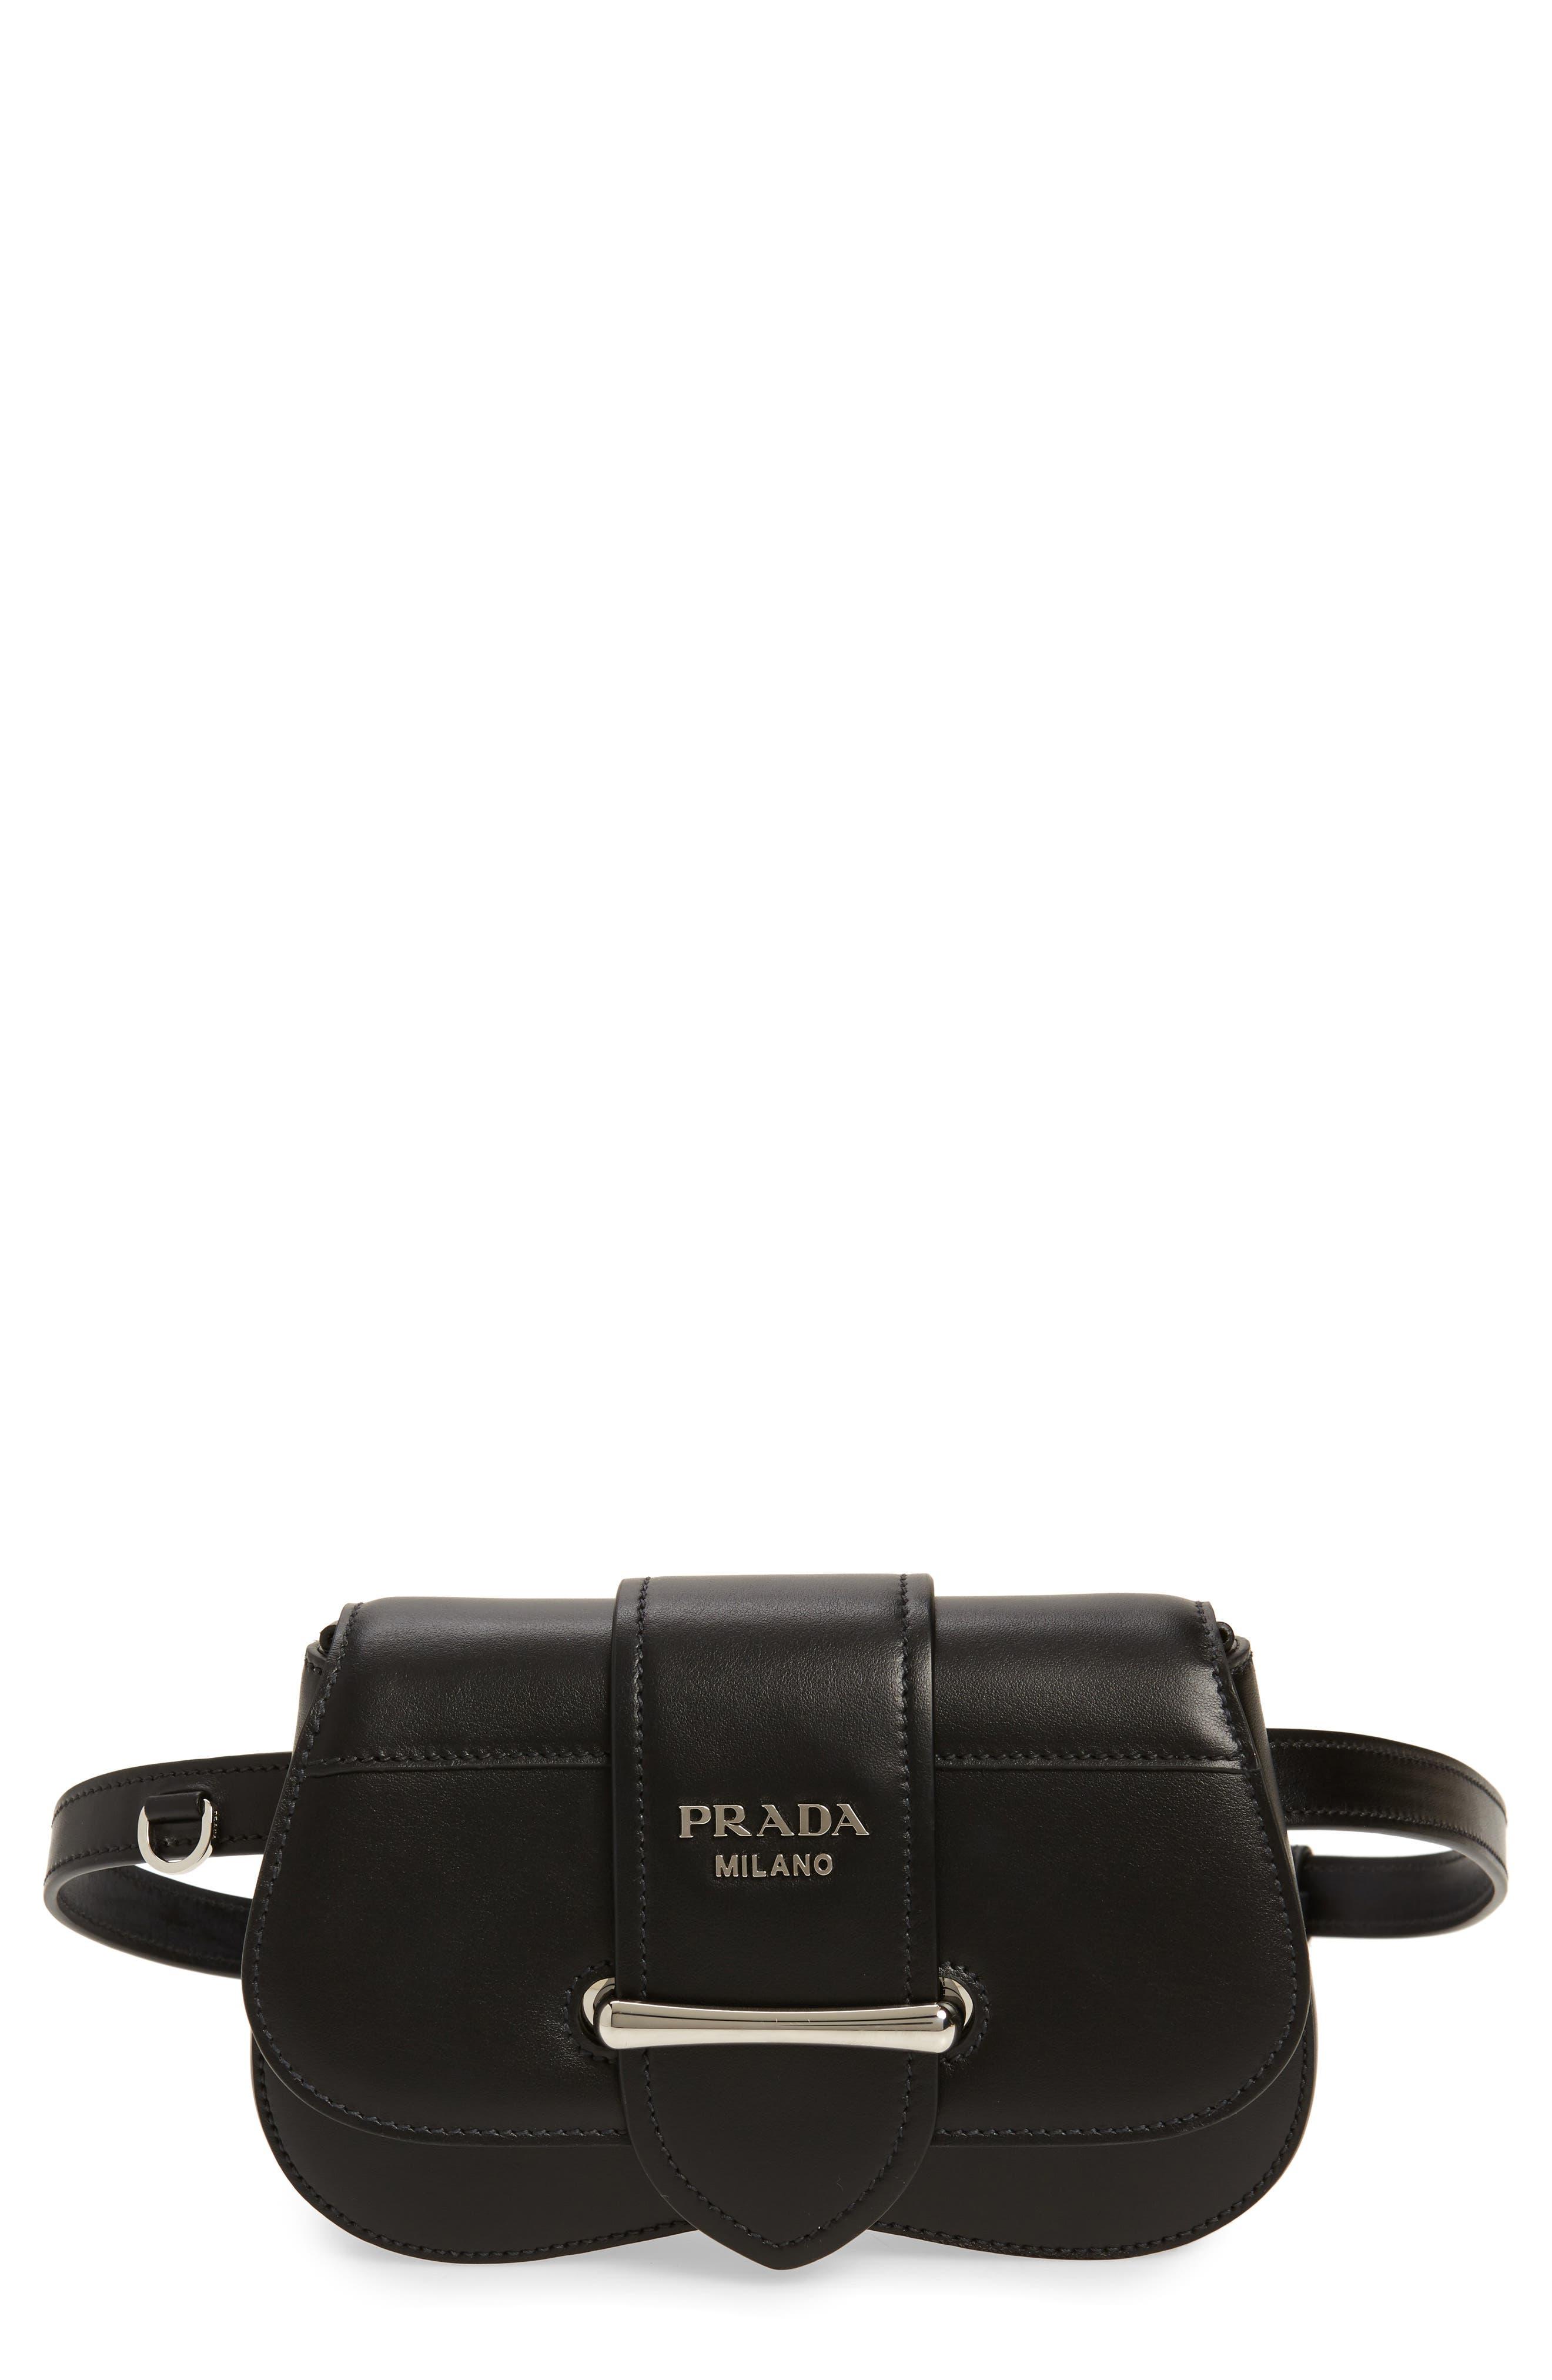 56b407daf9e0 Prada Belt Bags & Fanny Packs | Nordstrom